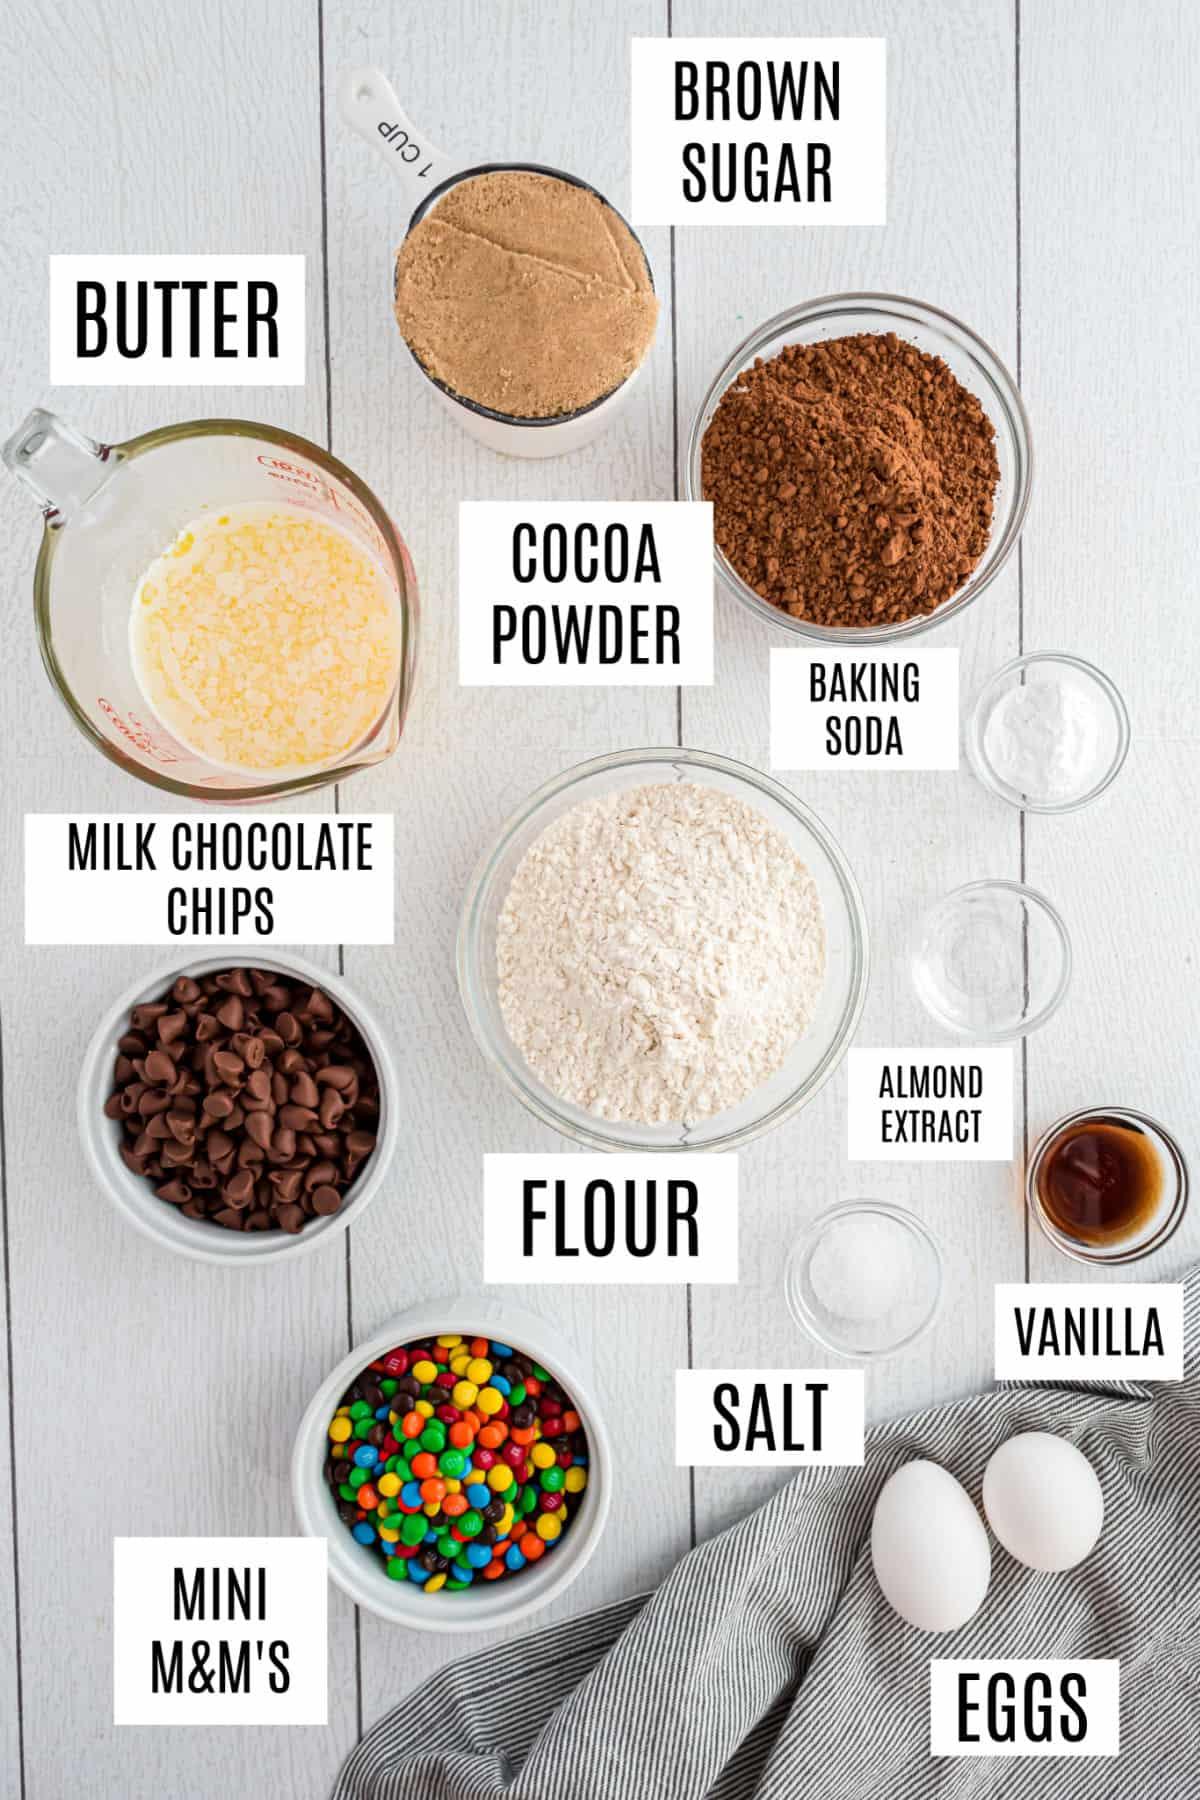 Ingredients needed to make chocolate m&ms cookies.